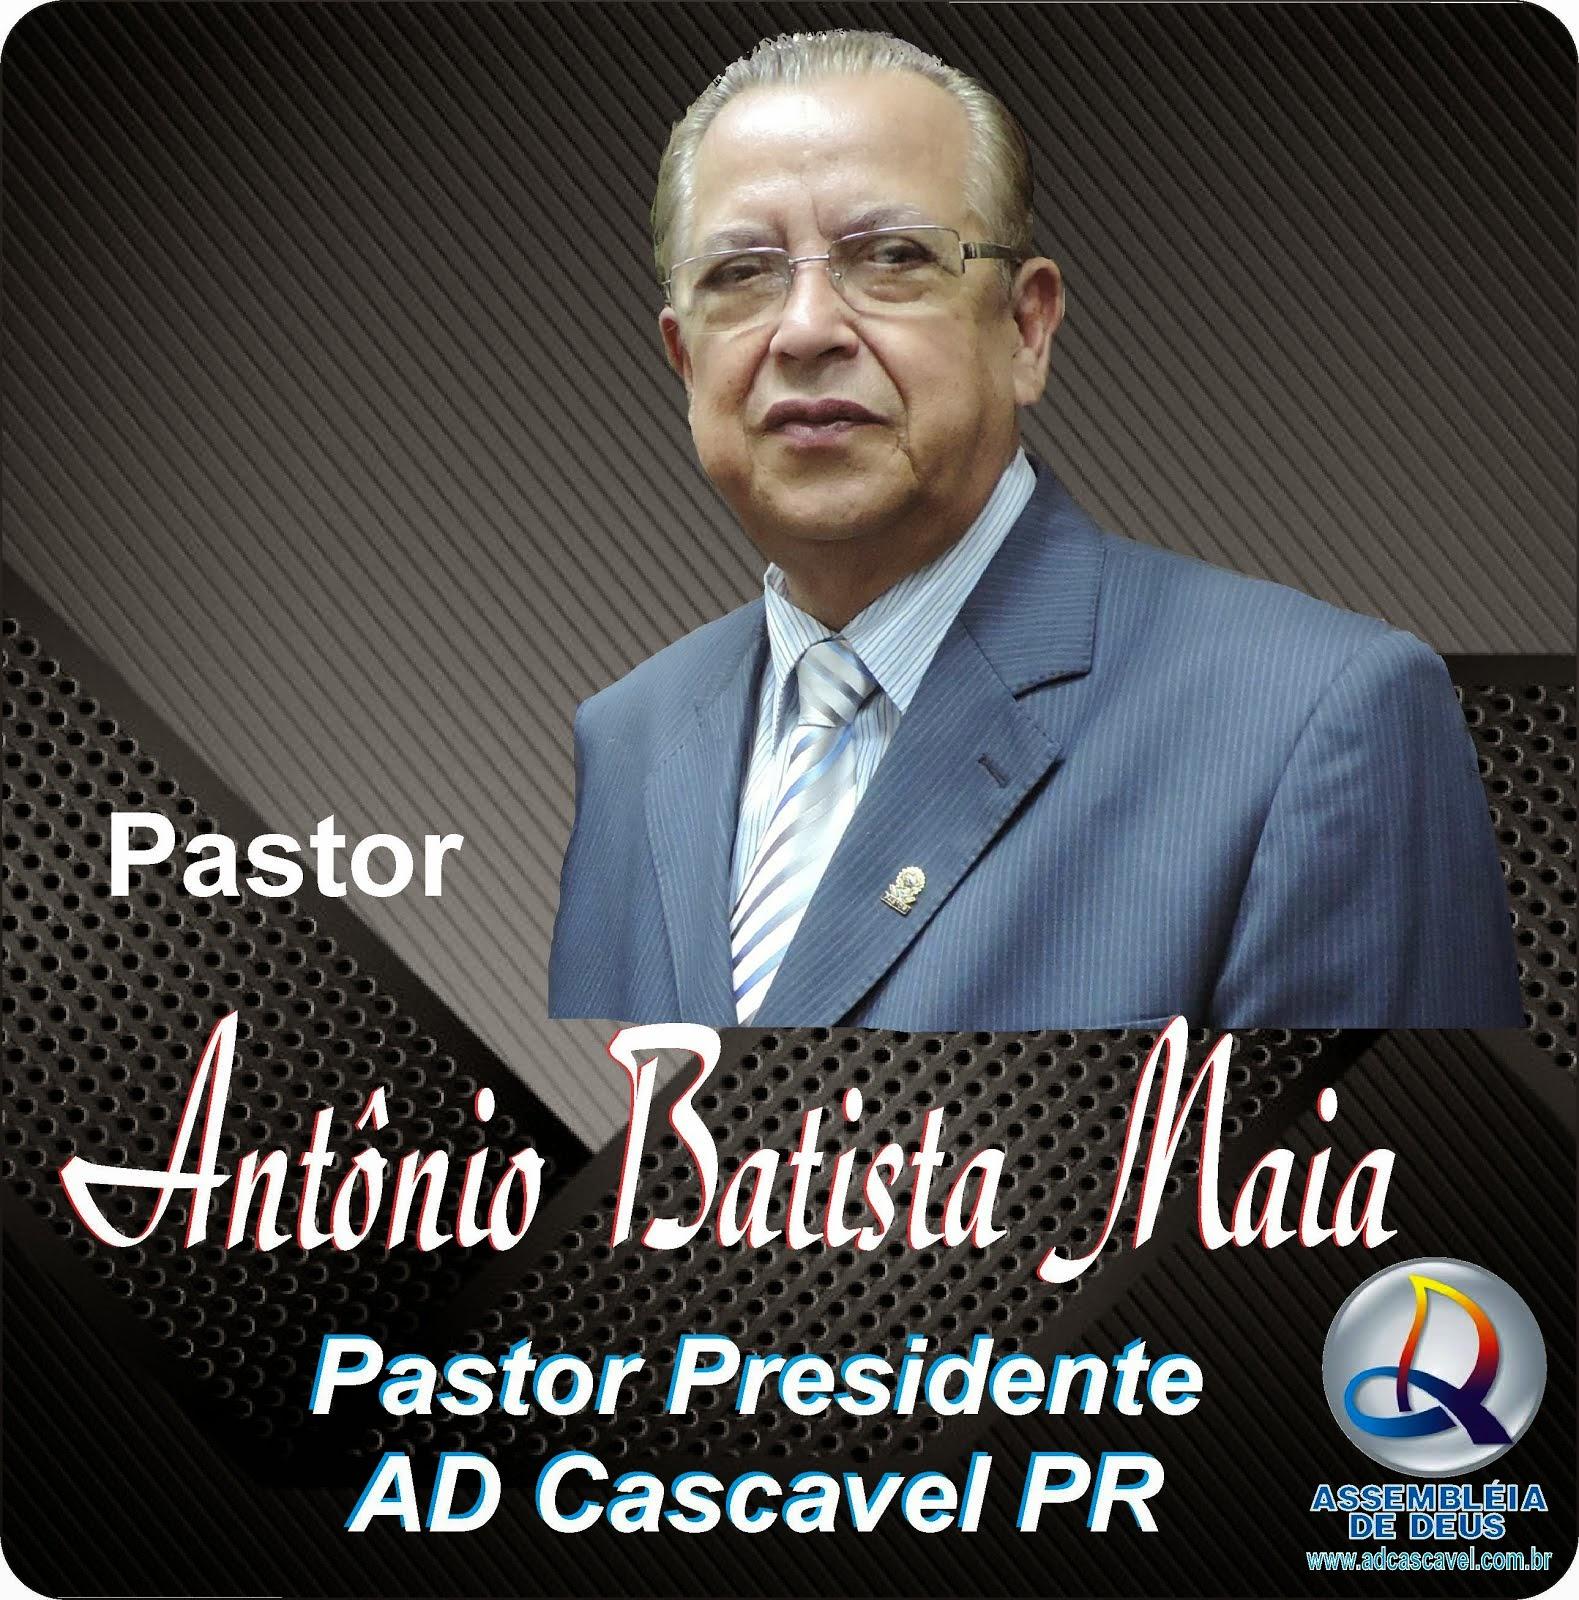 Pr. Antonio Batista Maia